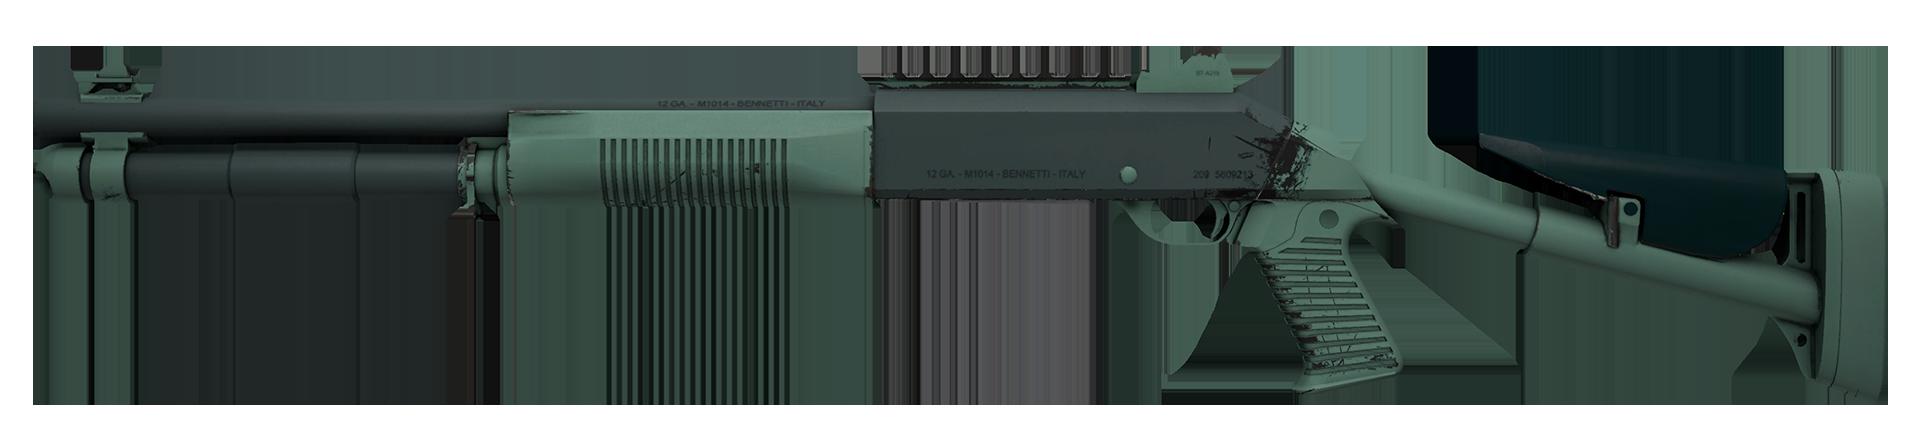 XM1014 Blue Spruce Large Rendering